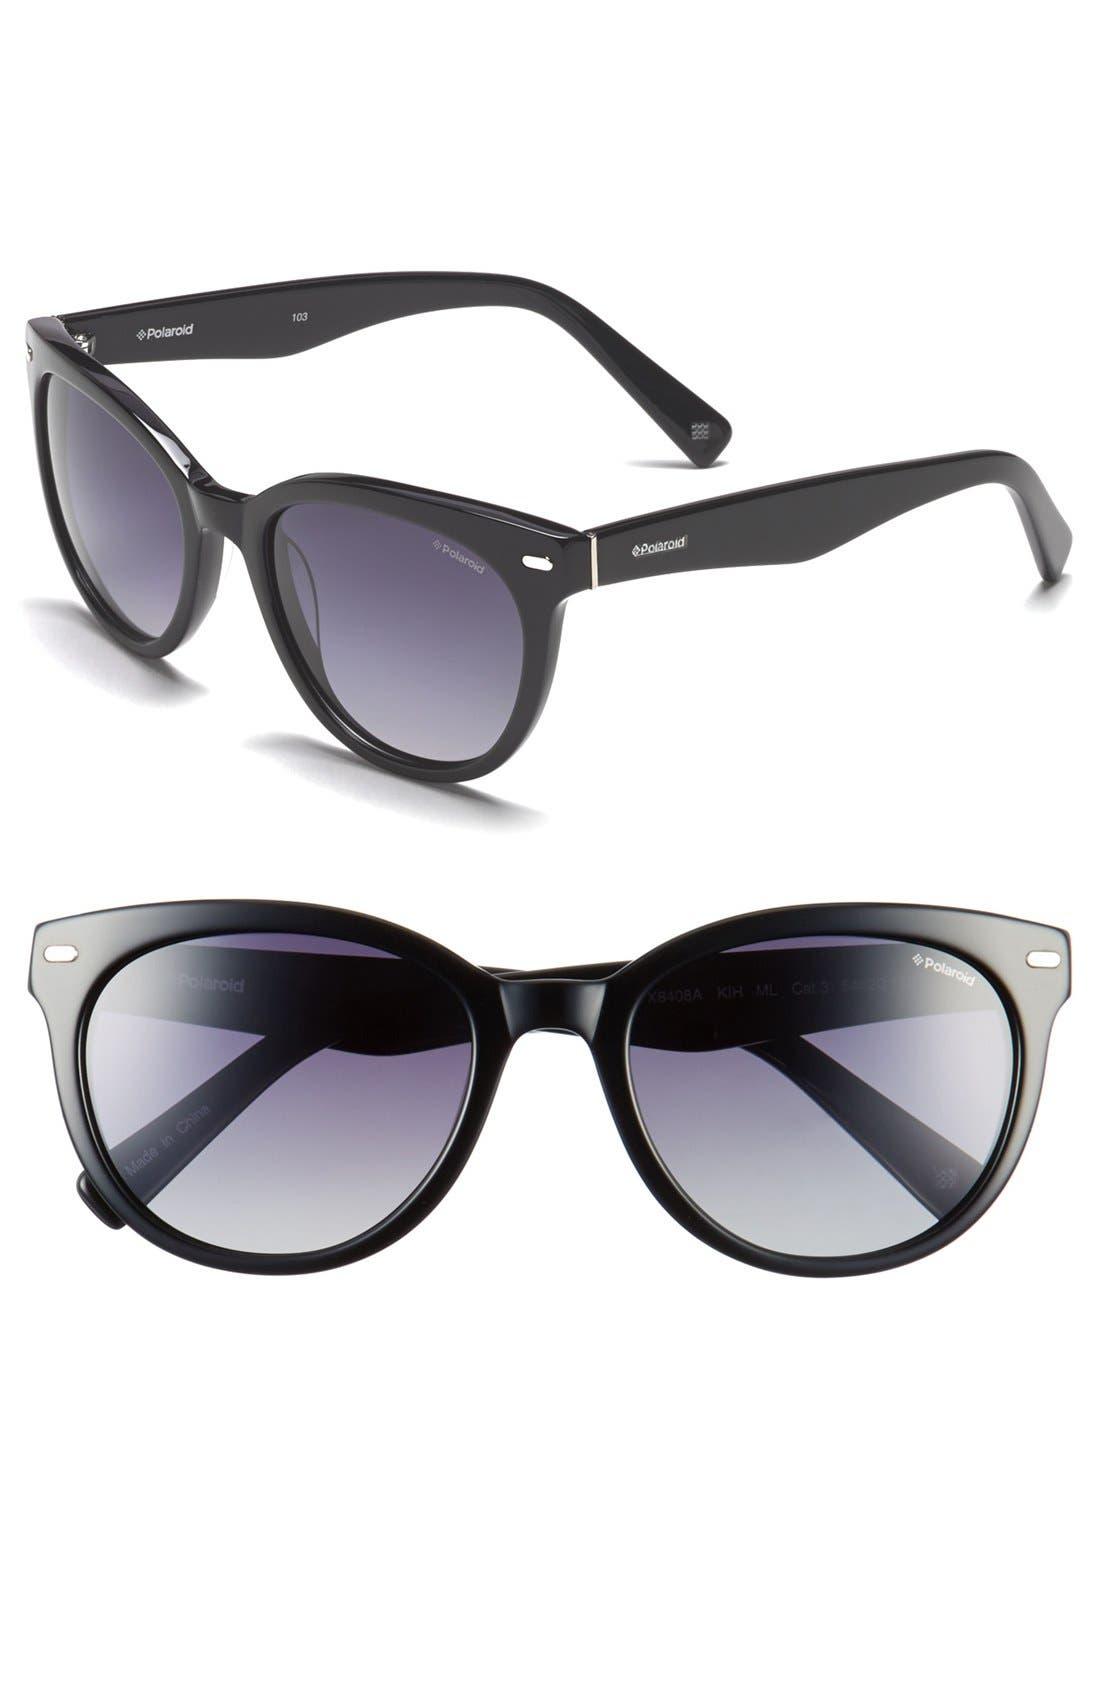 Eyewear 54mm Retro Polarized Sunglasses,                         Main,                         color, 001